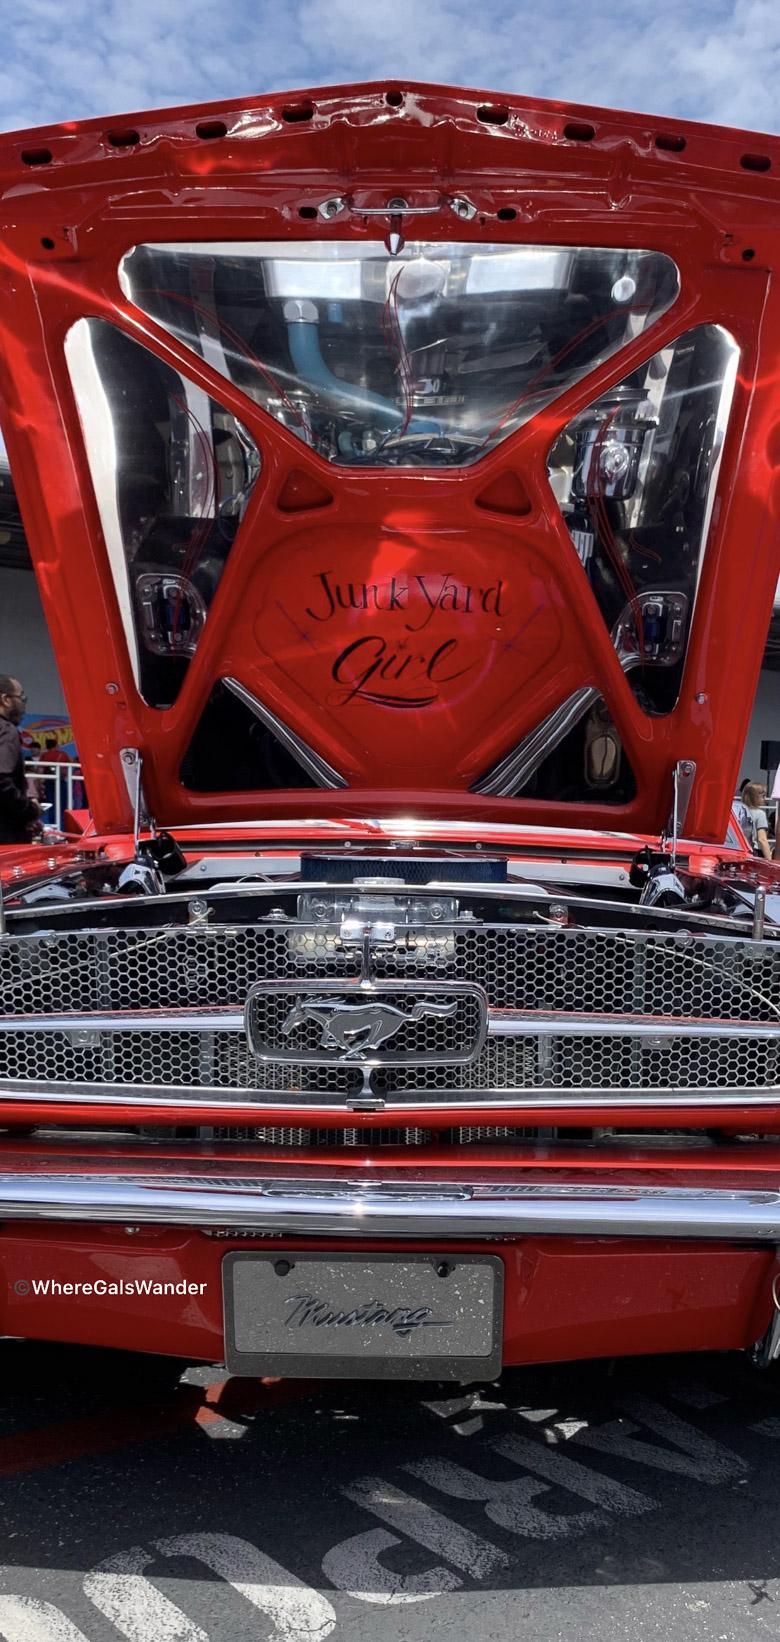 Mustang WhereGalsWander cars Hot Wheels